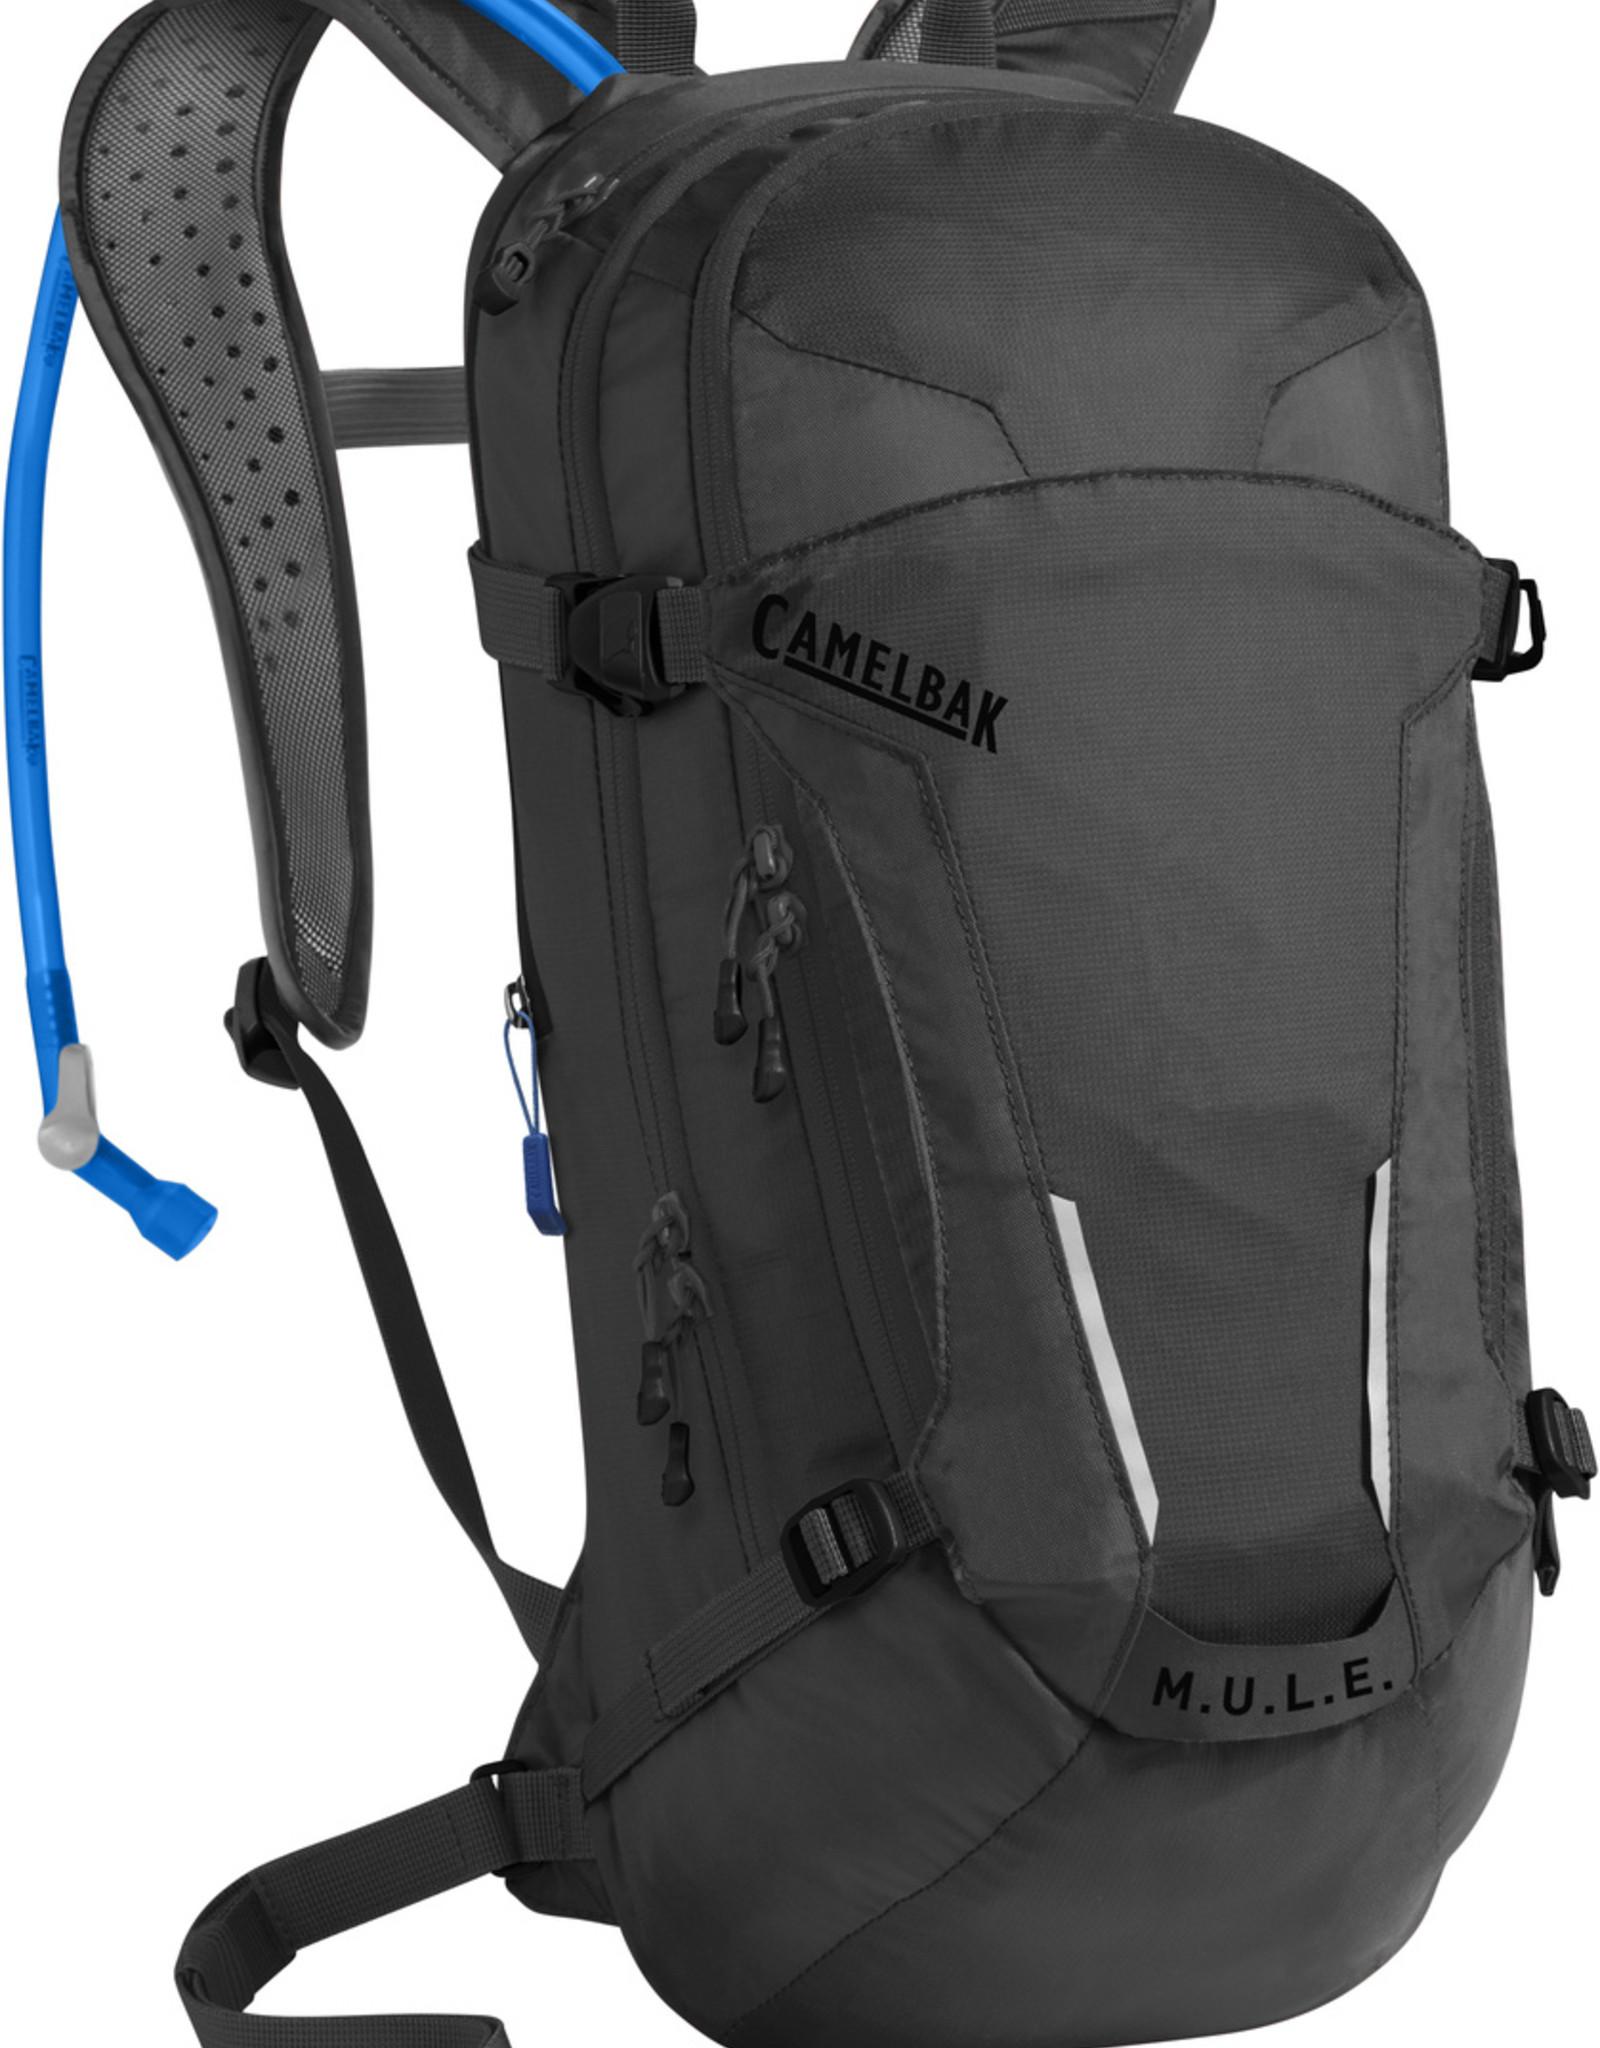 camelback 360017 Mule 2.9 L